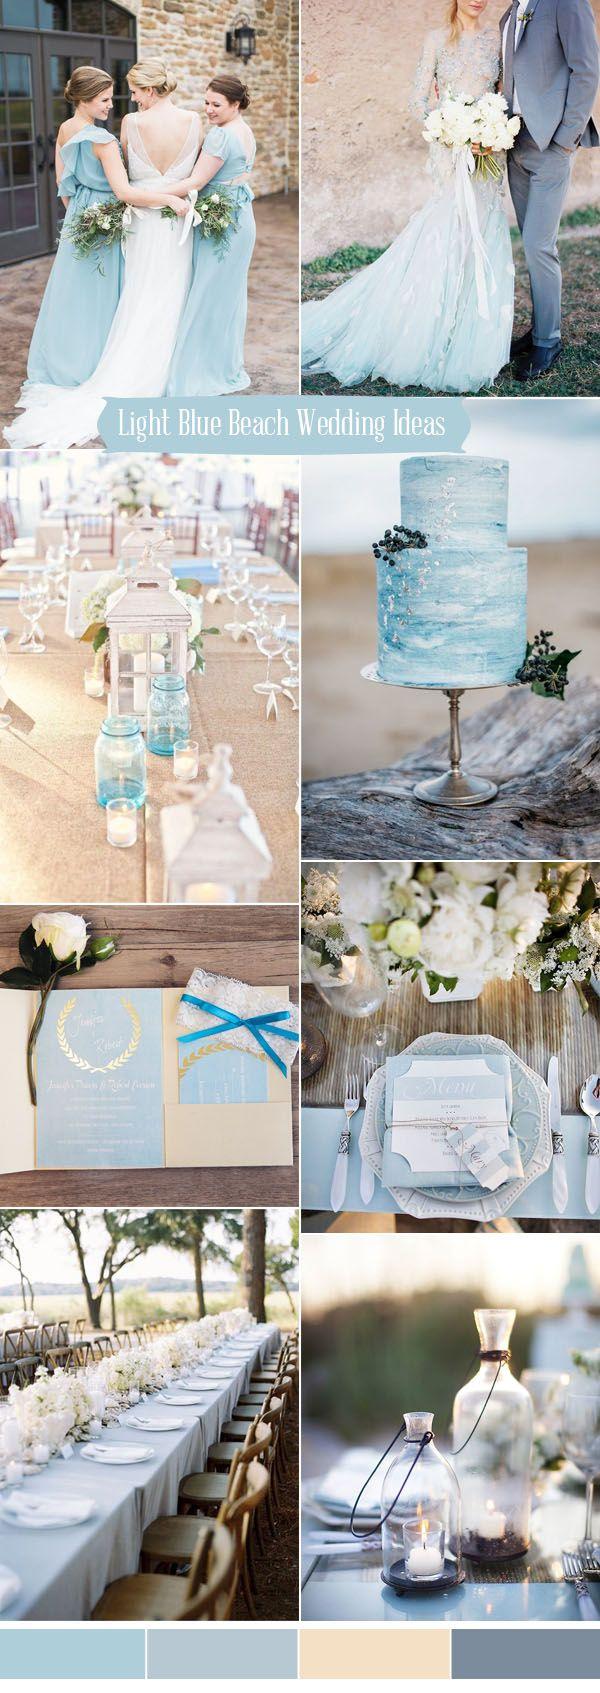 Light blue wedding decoration ideas   best Ideas images on Pinterest  Wedding ideas Wedding colors and